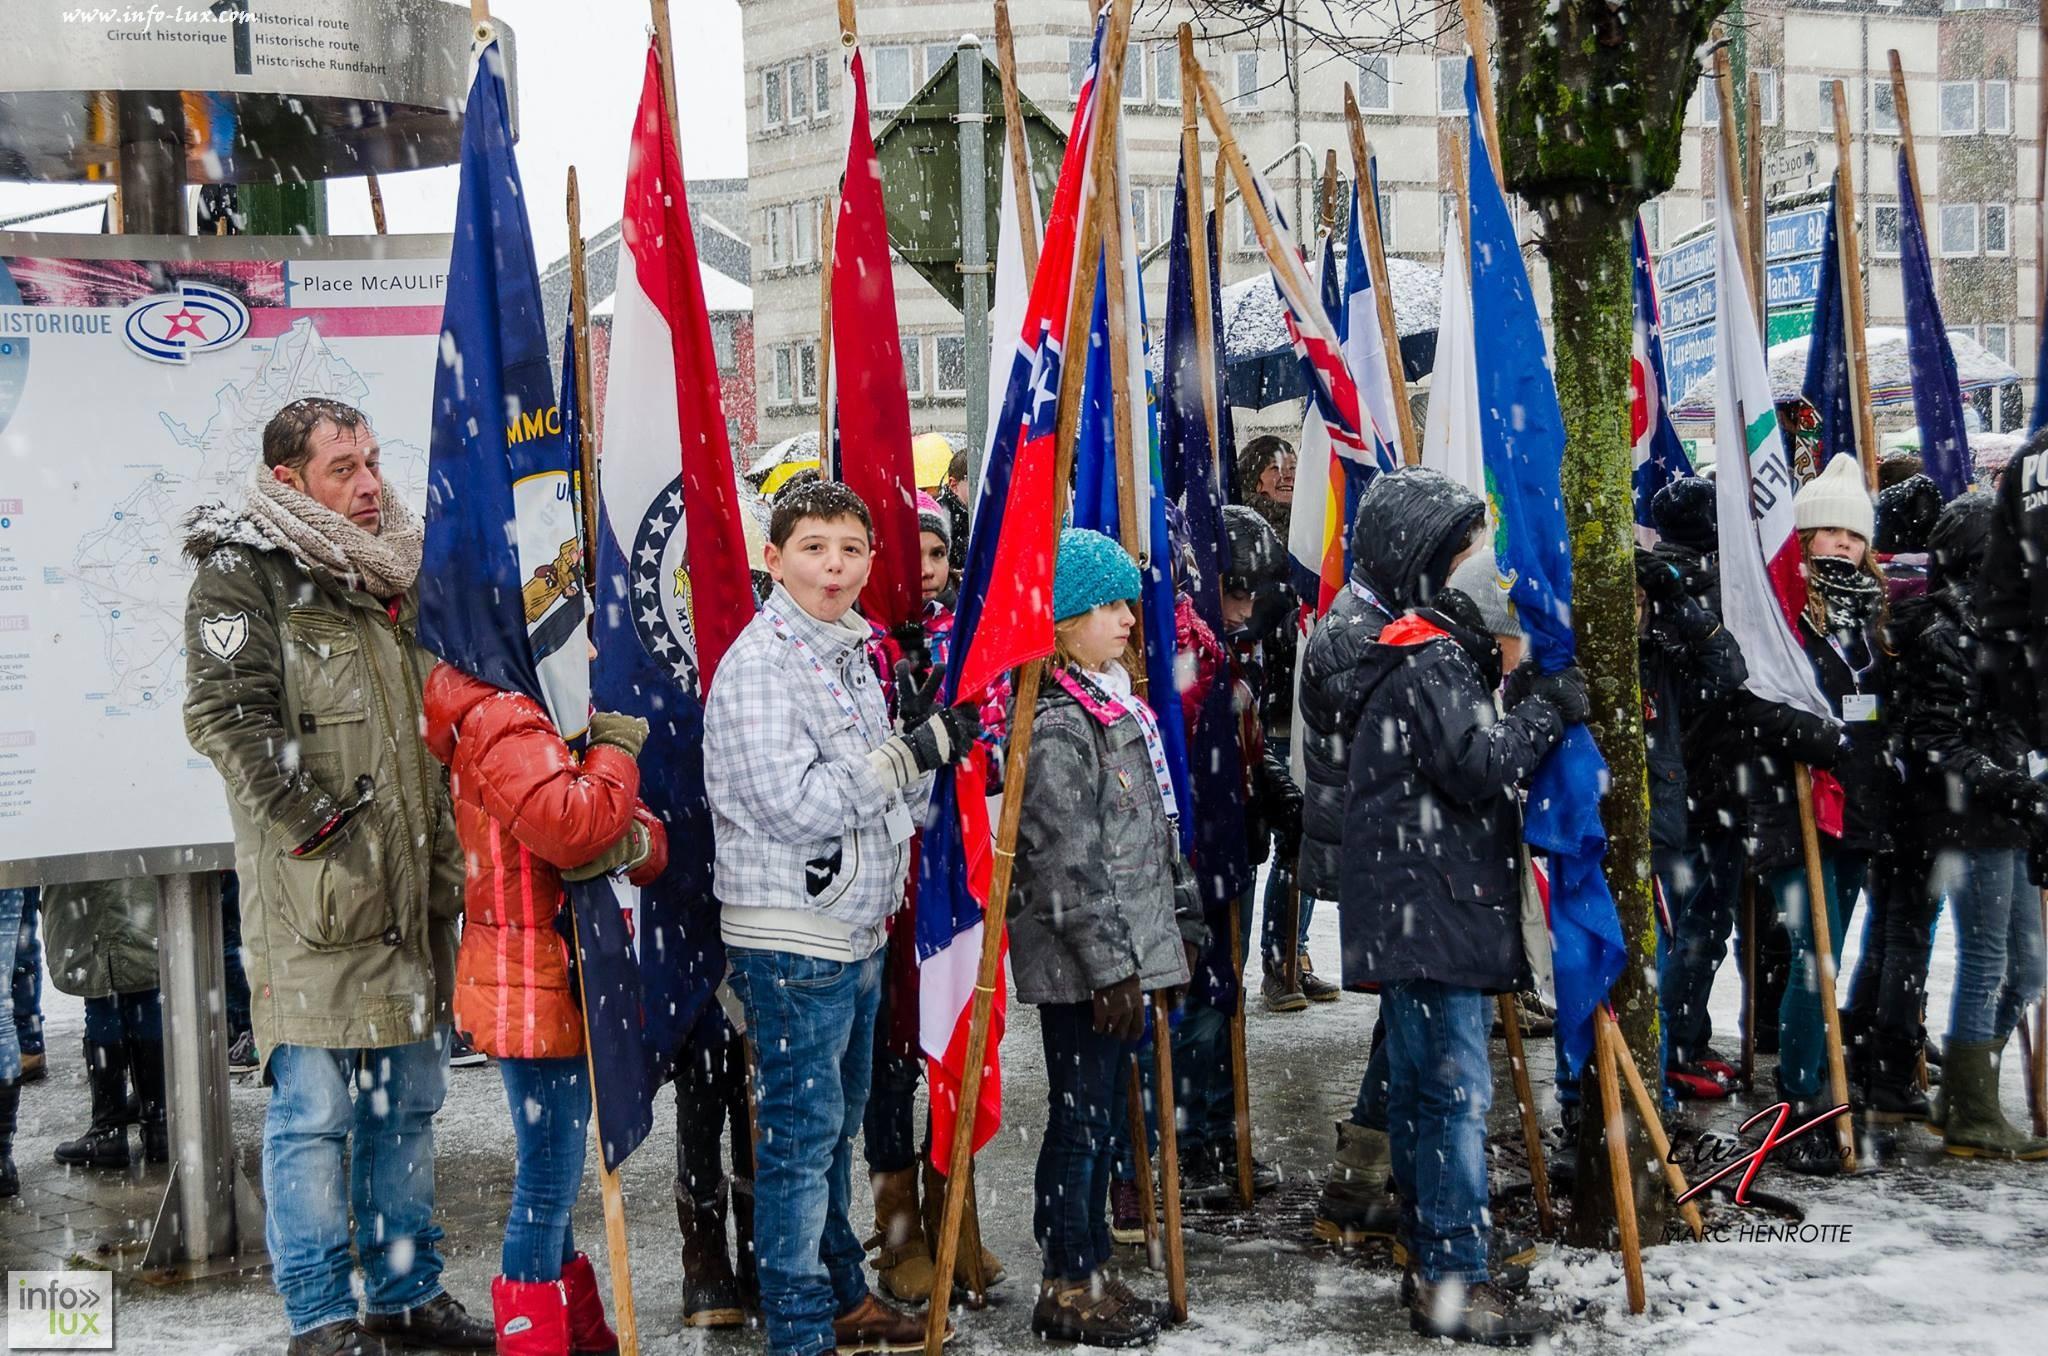 images/stories/PHOTOSREP/Bastogne/70ansMarc1/infoluxBAS047